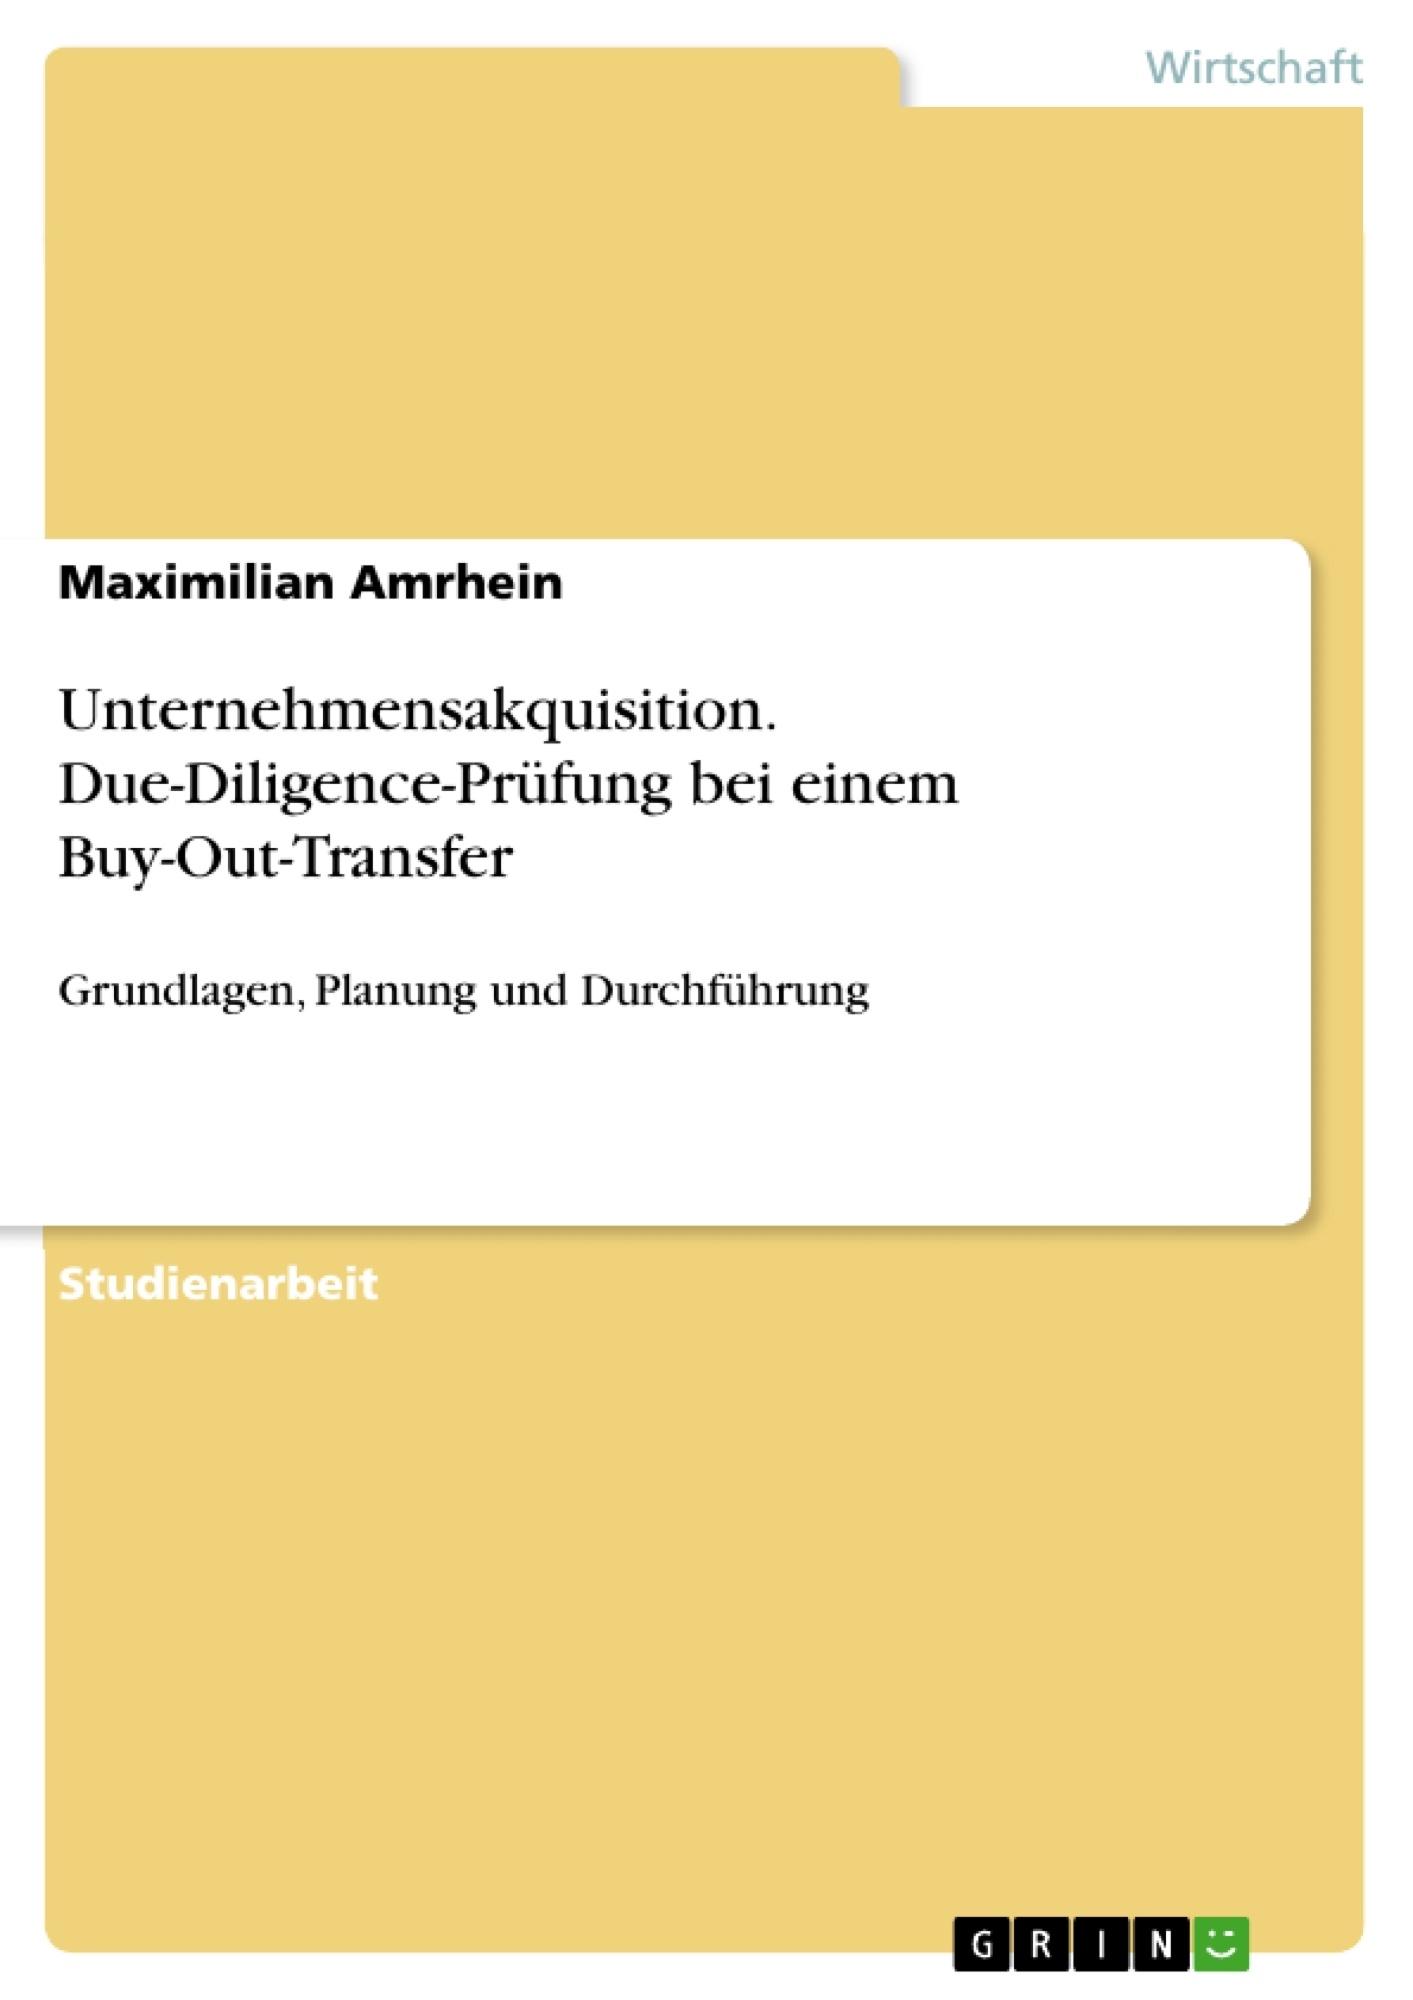 Titel: Unternehmensakquisition. Due-Diligence-Prüfung bei einem Buy-Out-Transfer